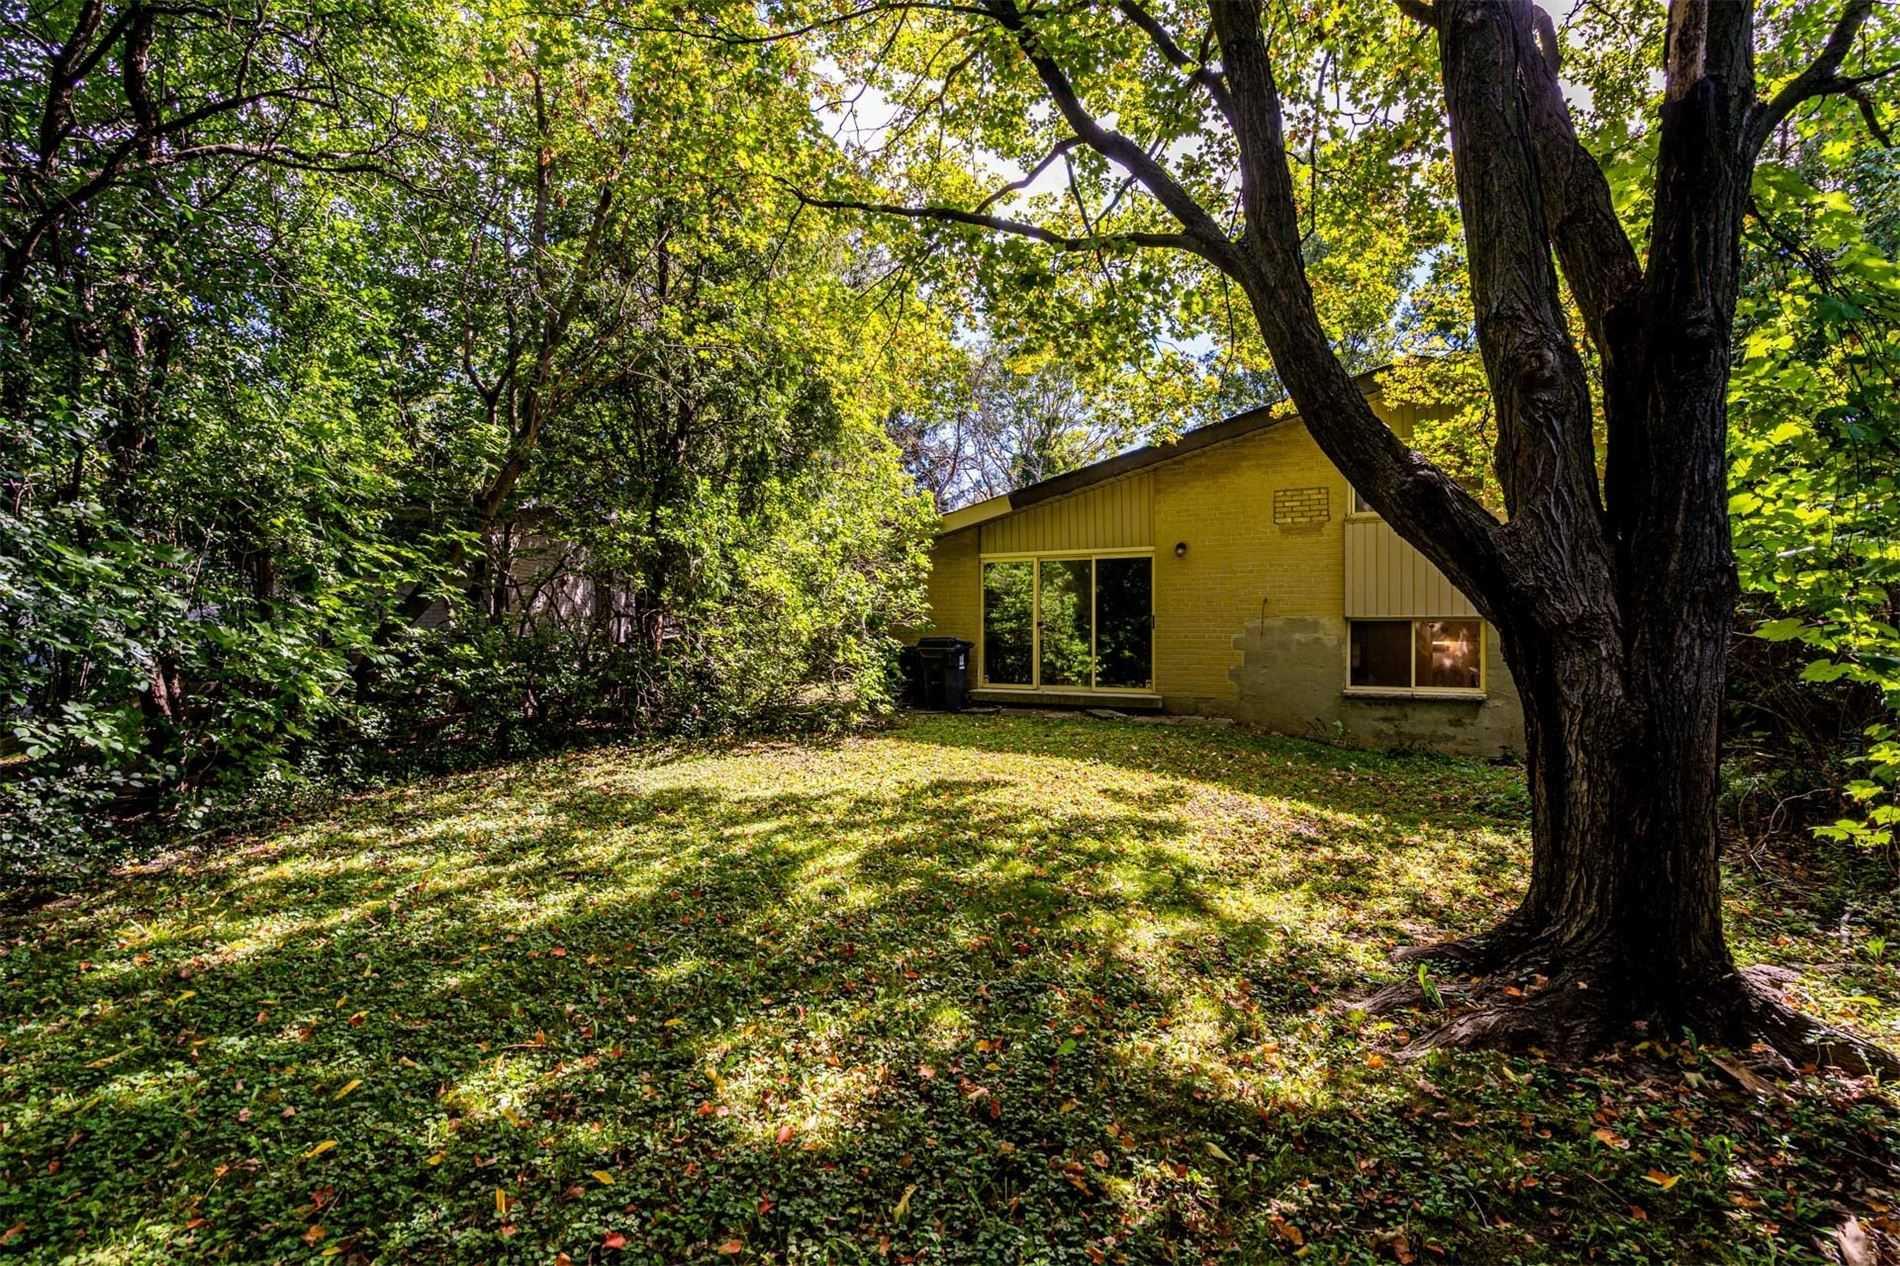 140 Verobeach Blvd - Humbermede Detached for sale, 3 Bedrooms (W5385046) - #32